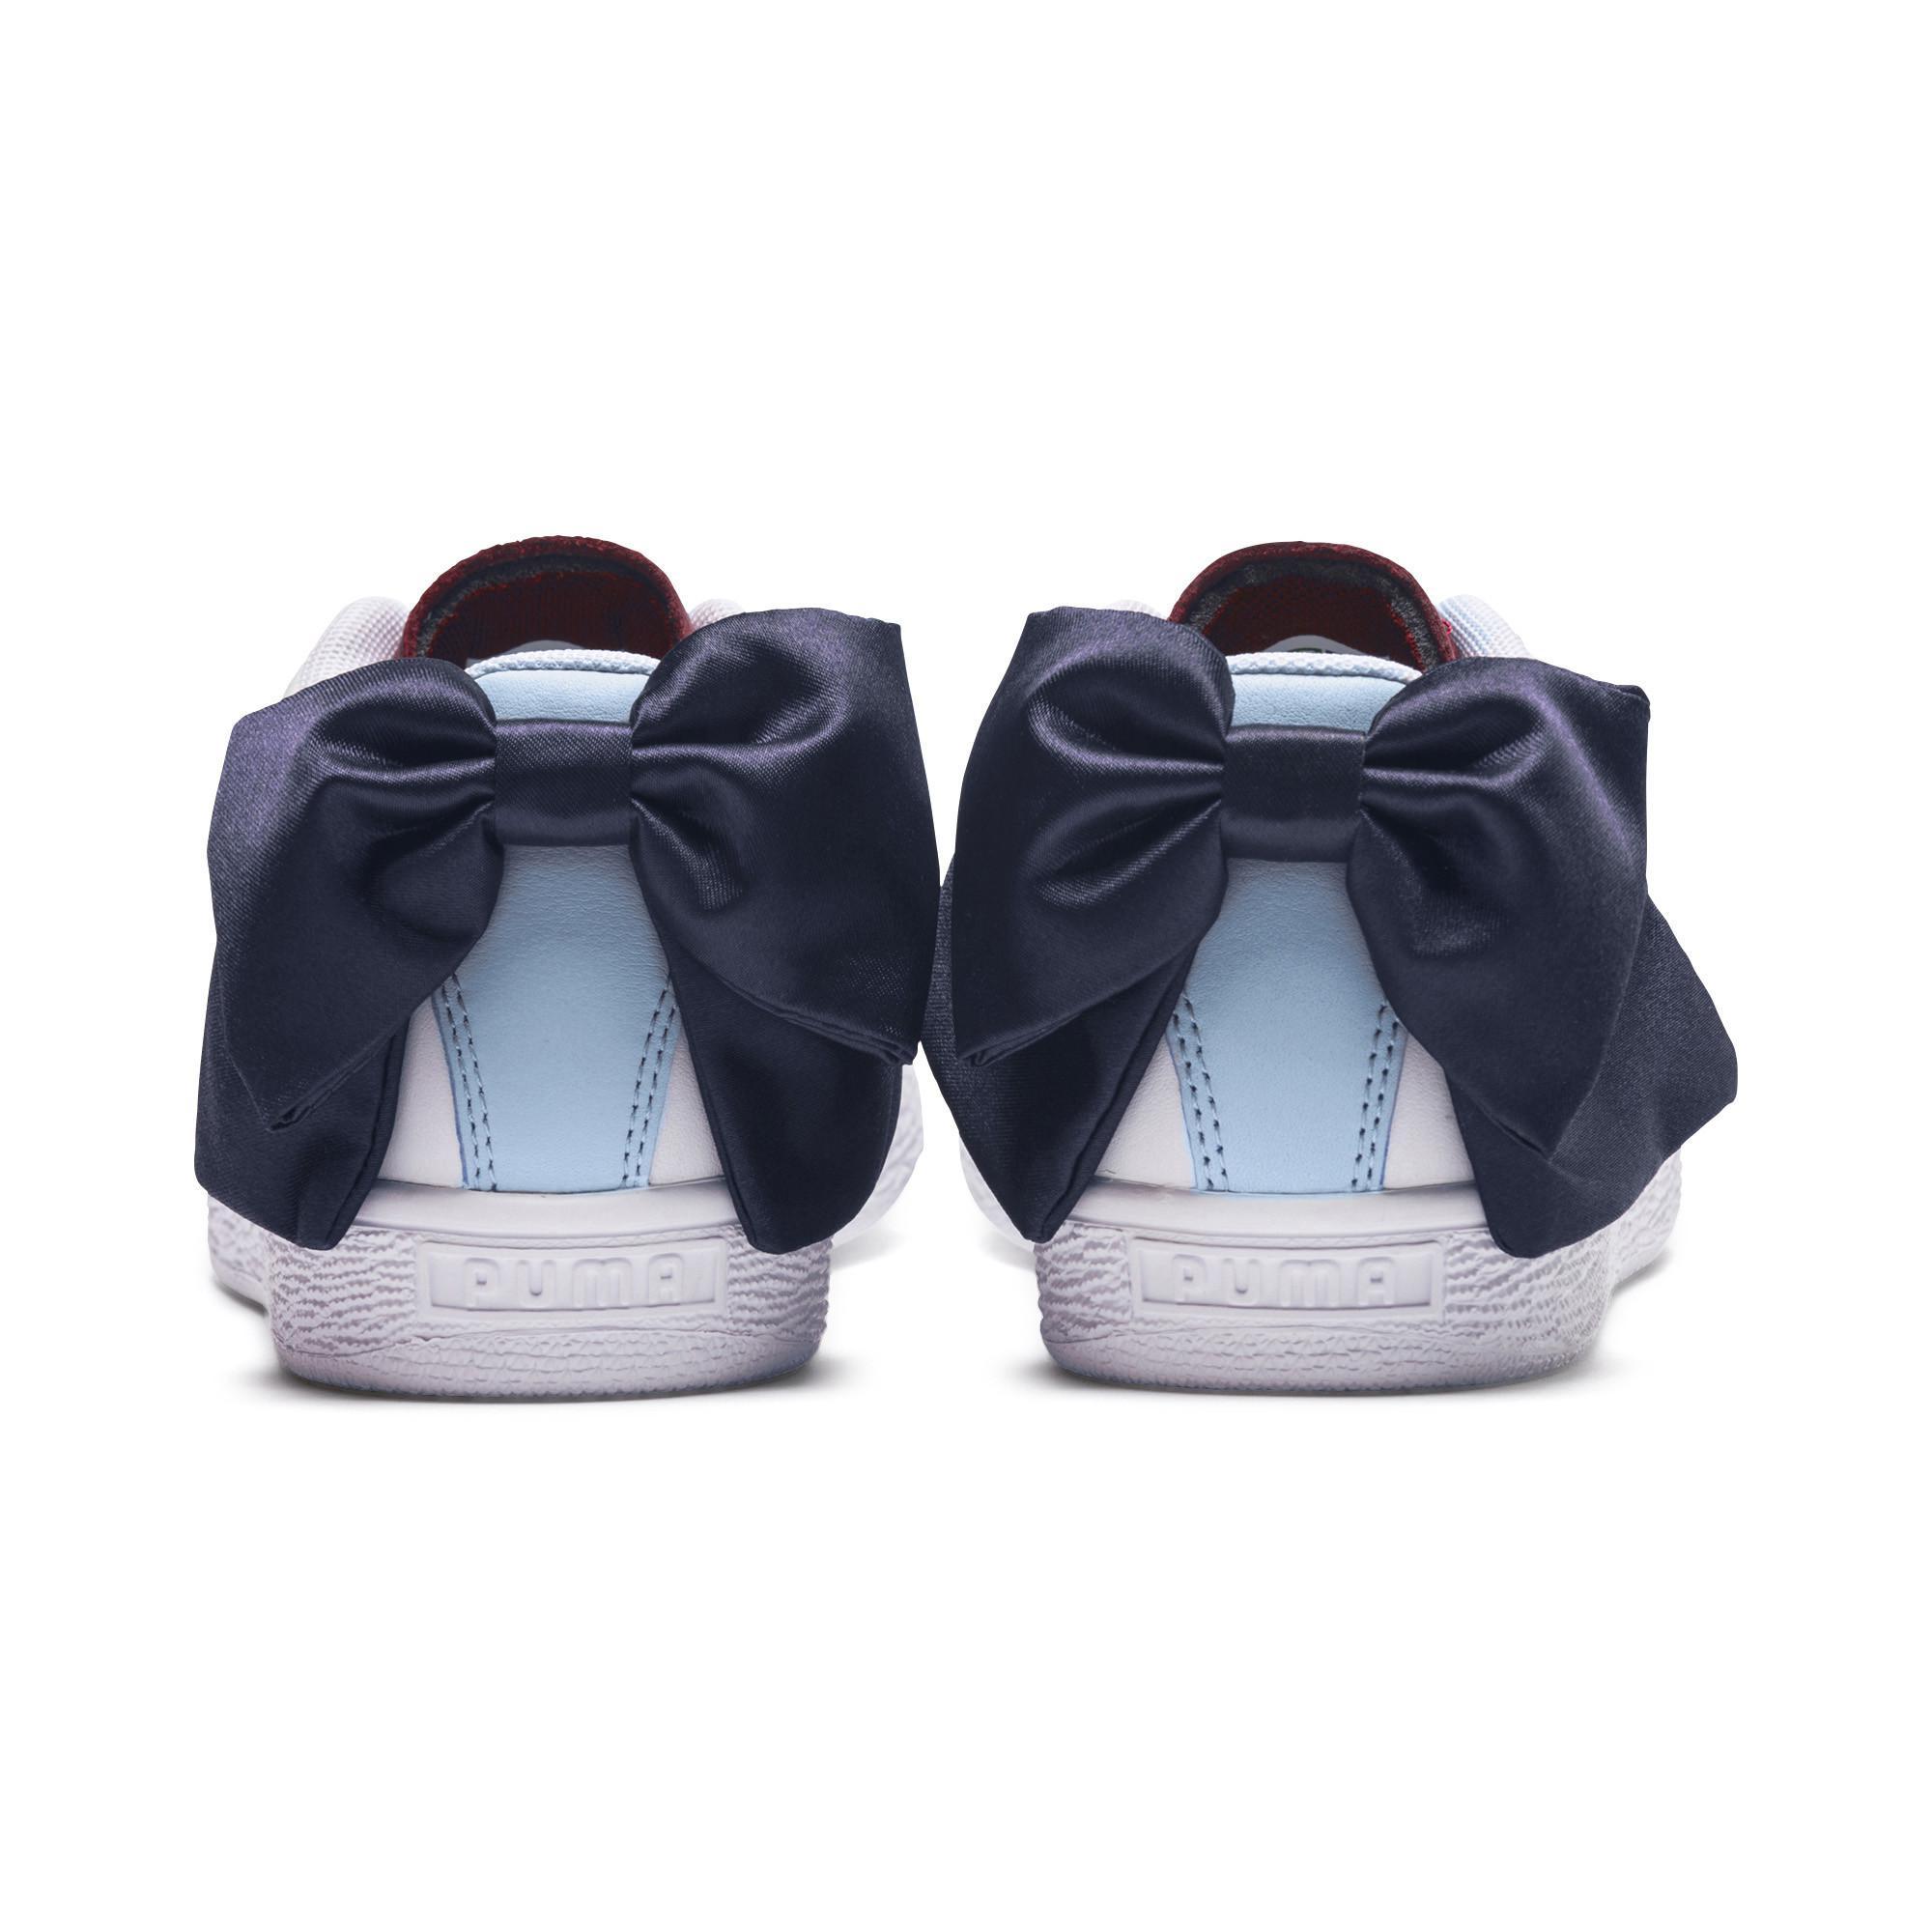 b1f6c2009a PUMA Multicolor Basket Bow New School Sneakers